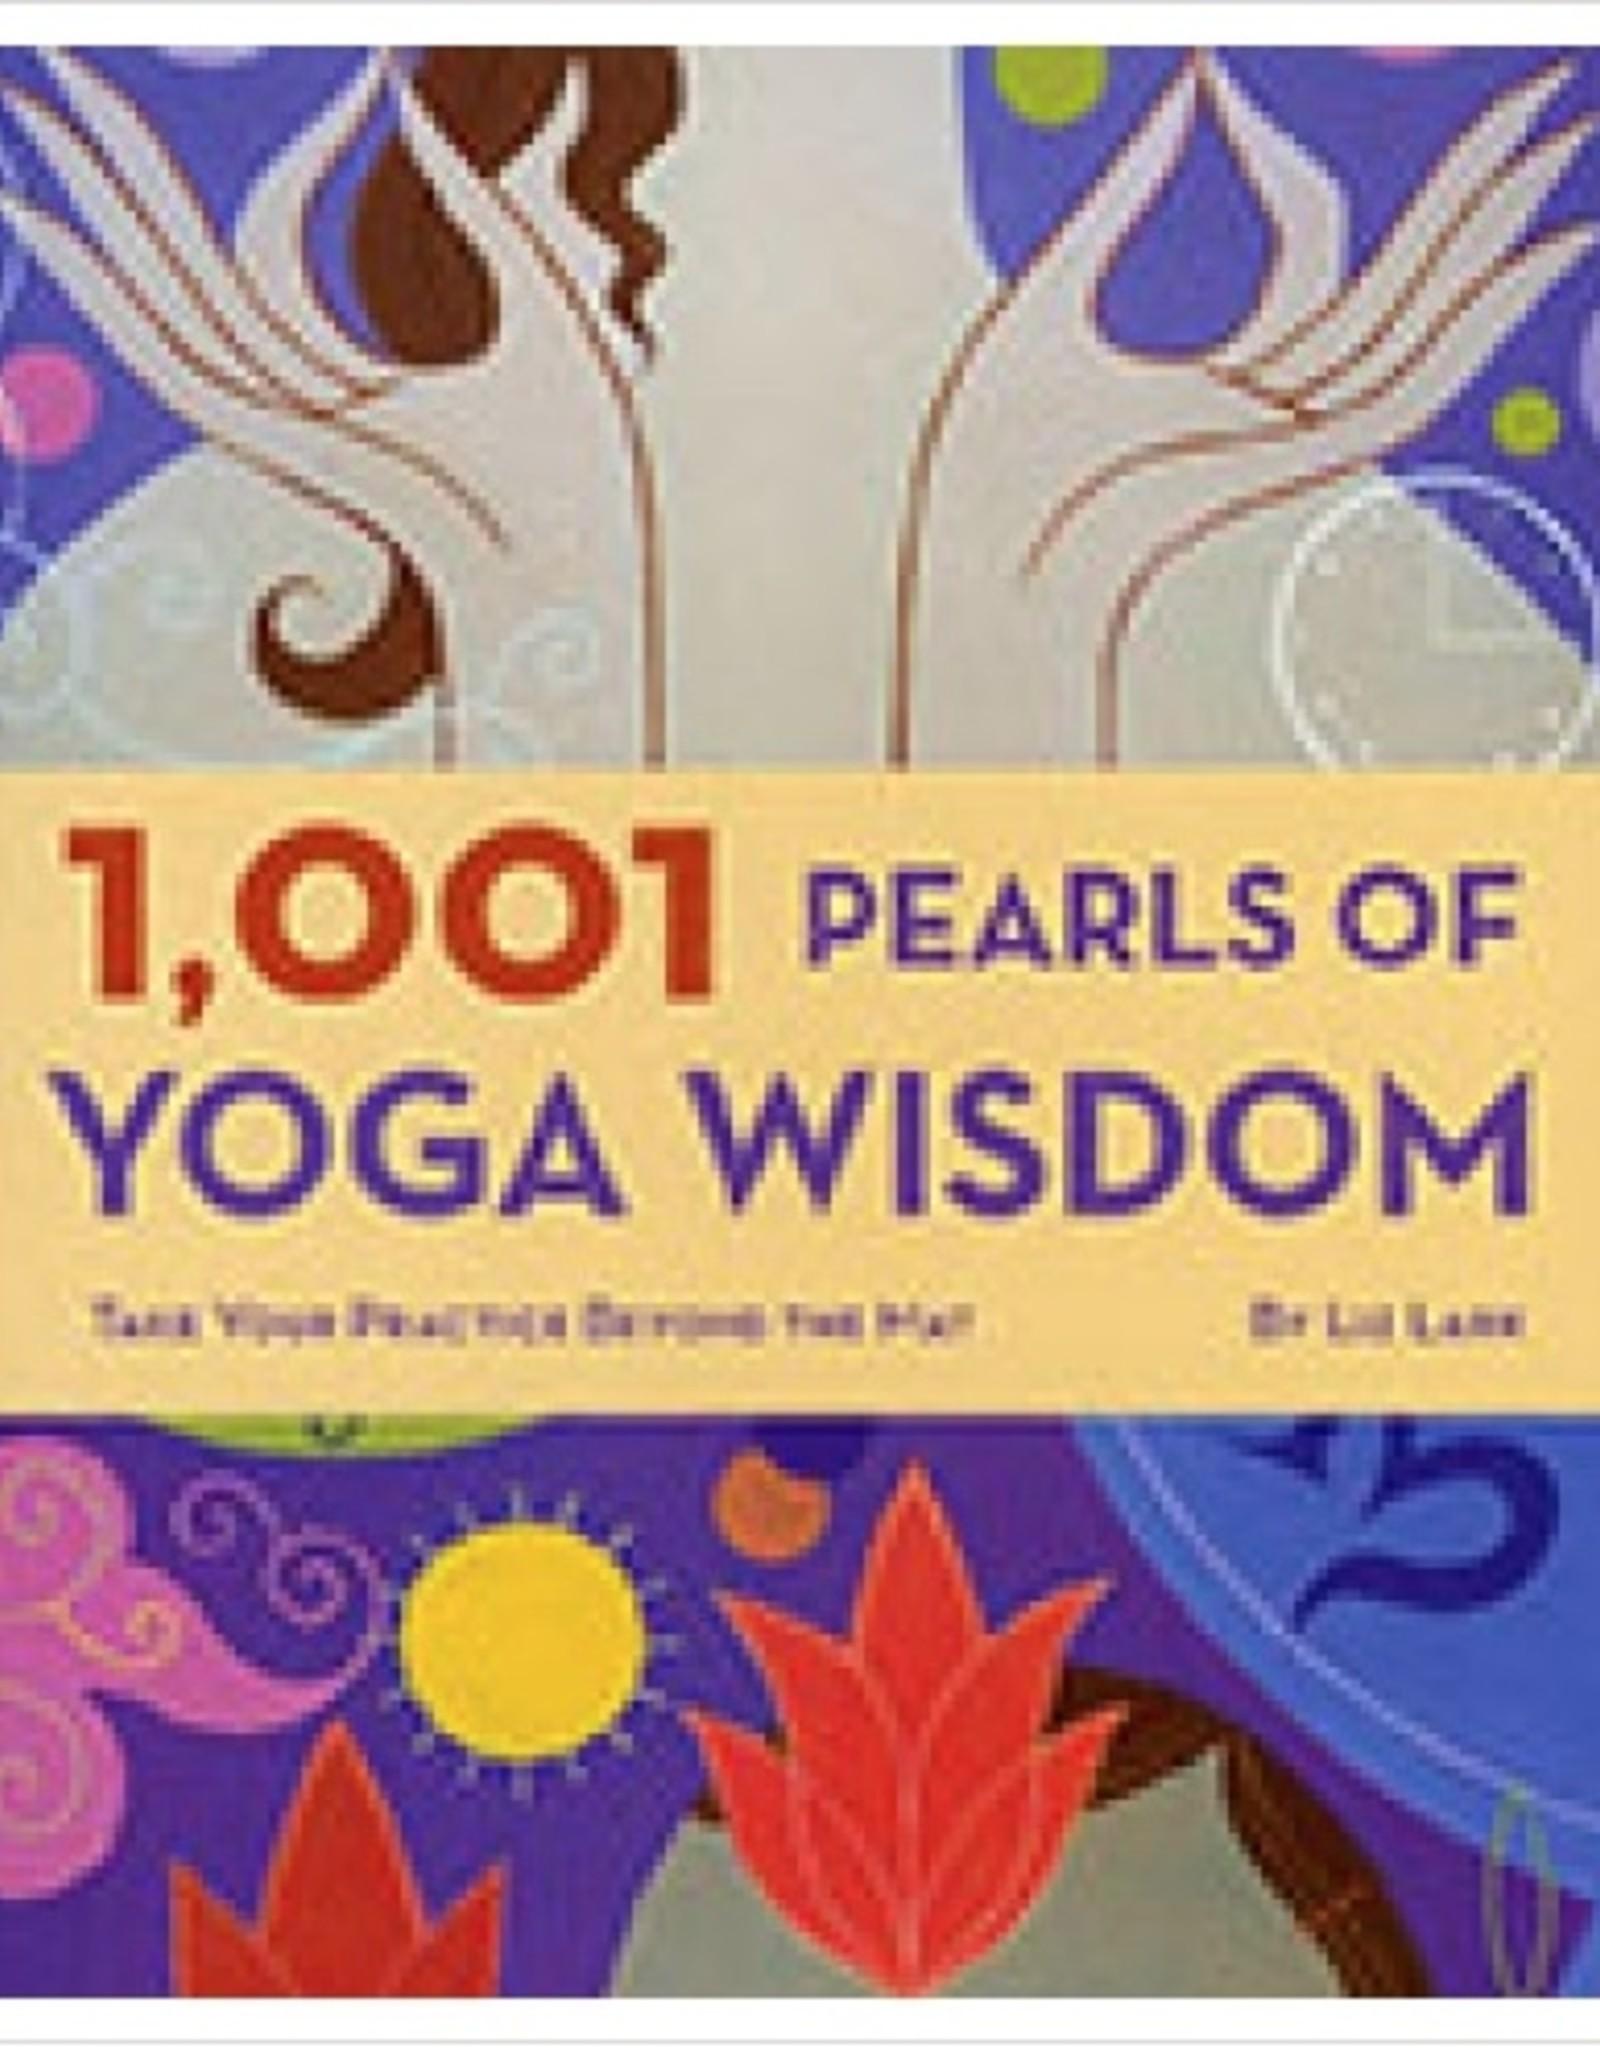 Integral Yoga Distribution 1001 Pearls of Yoga Wisdom